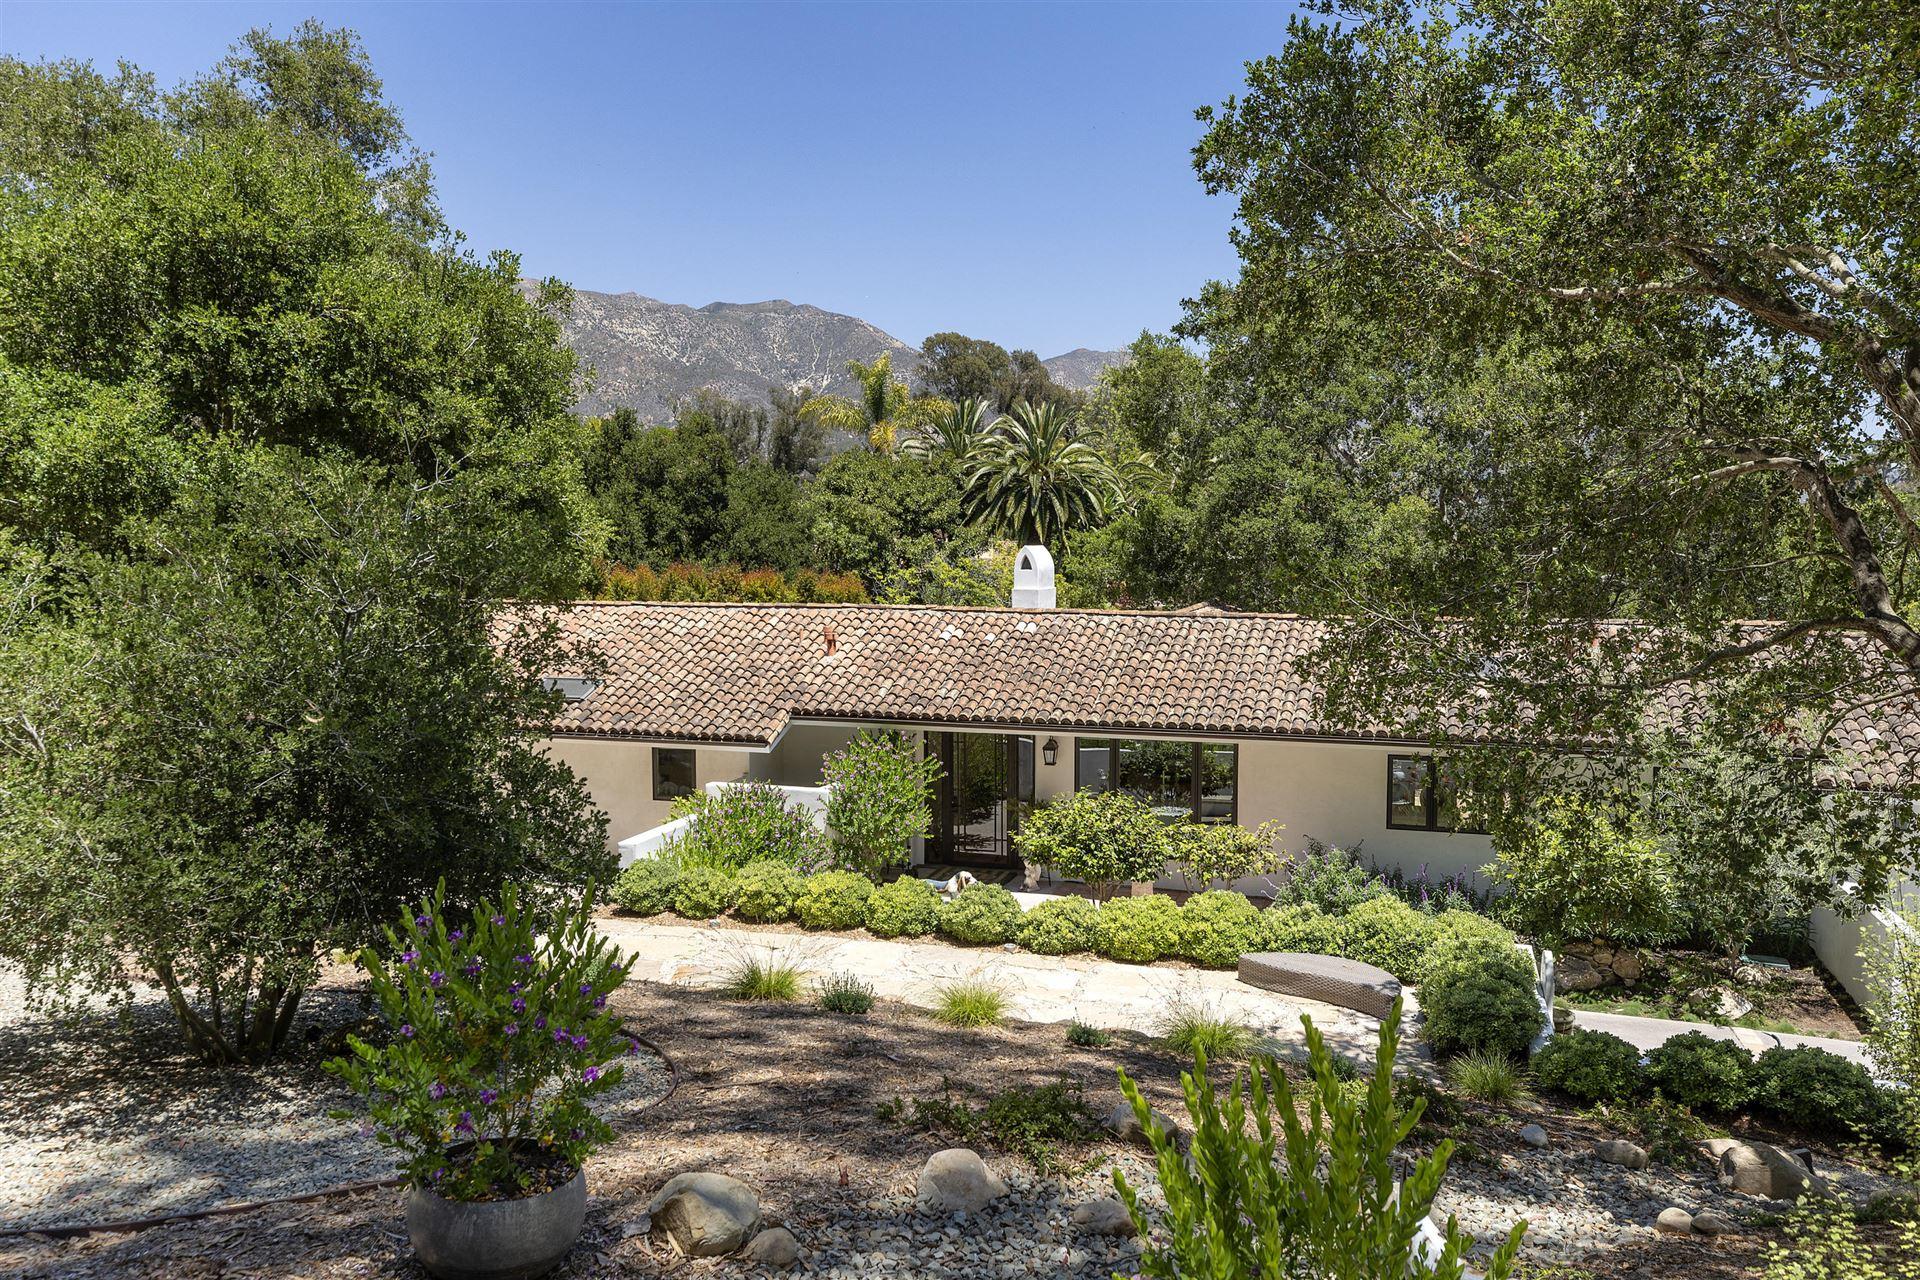 440 Woodley Rd                                                                               Santa Barbara                                                                      , CA - $5,900,000